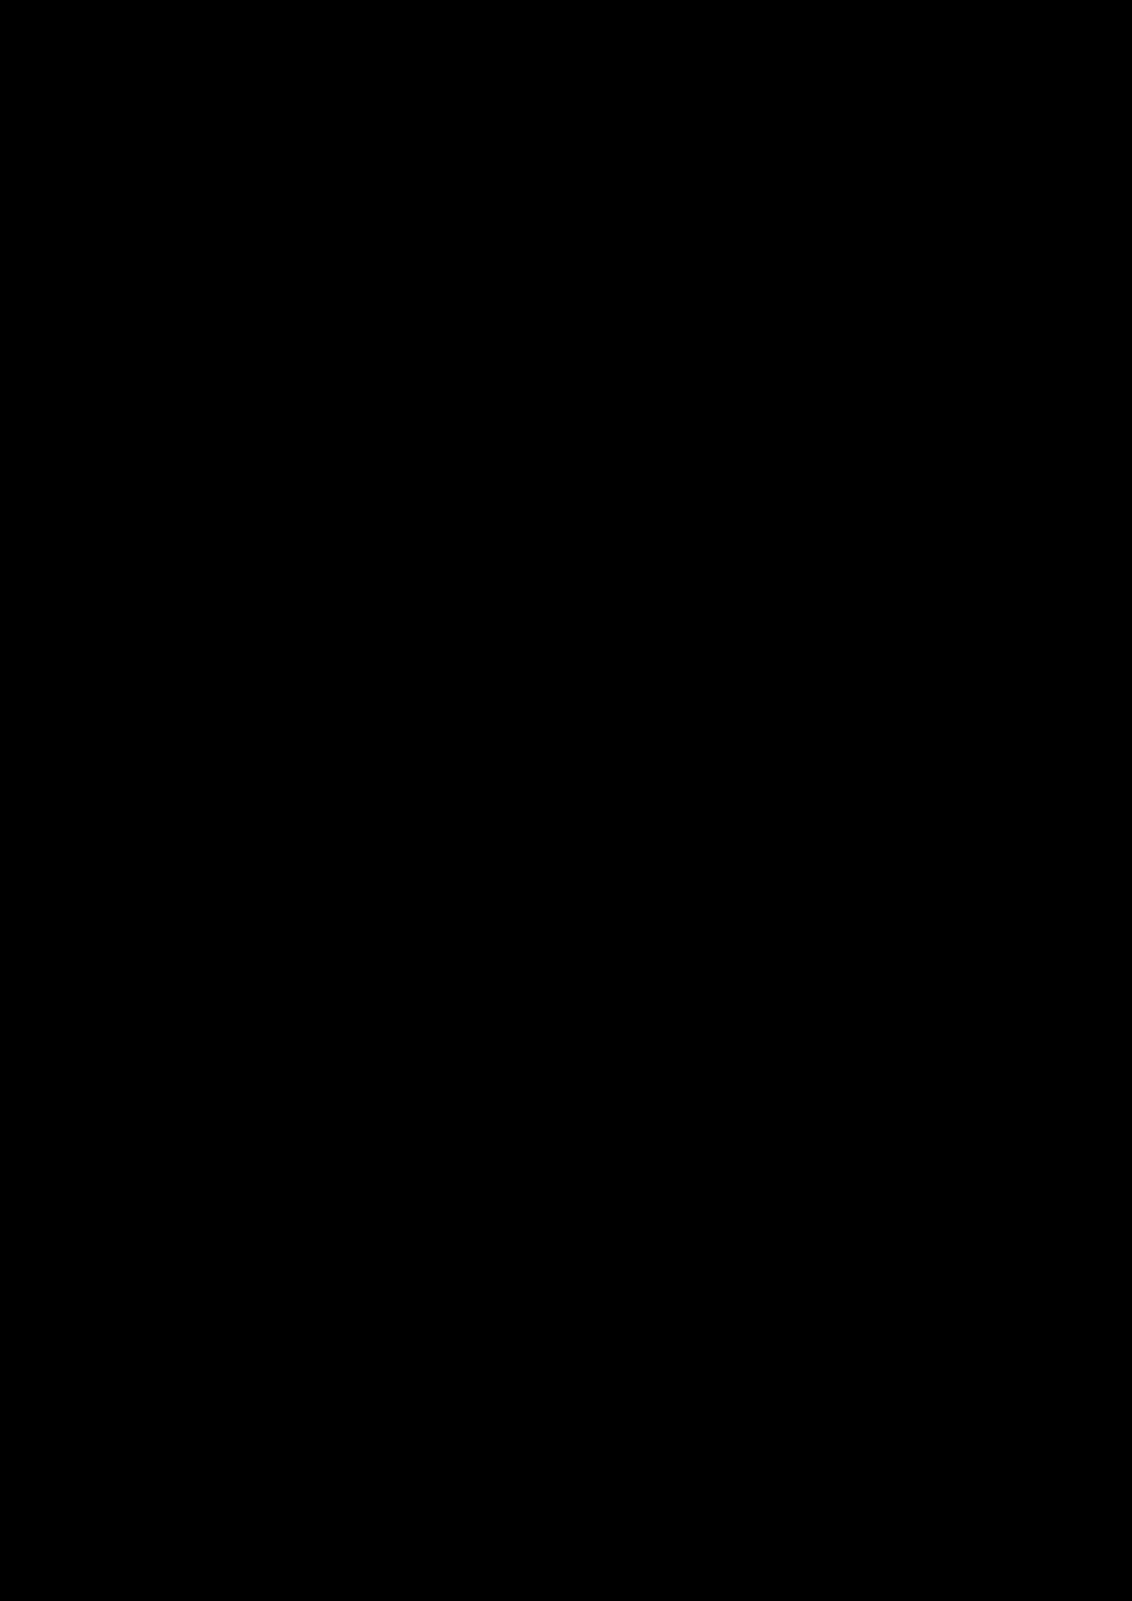 Belyiy sokol slide, Image 60